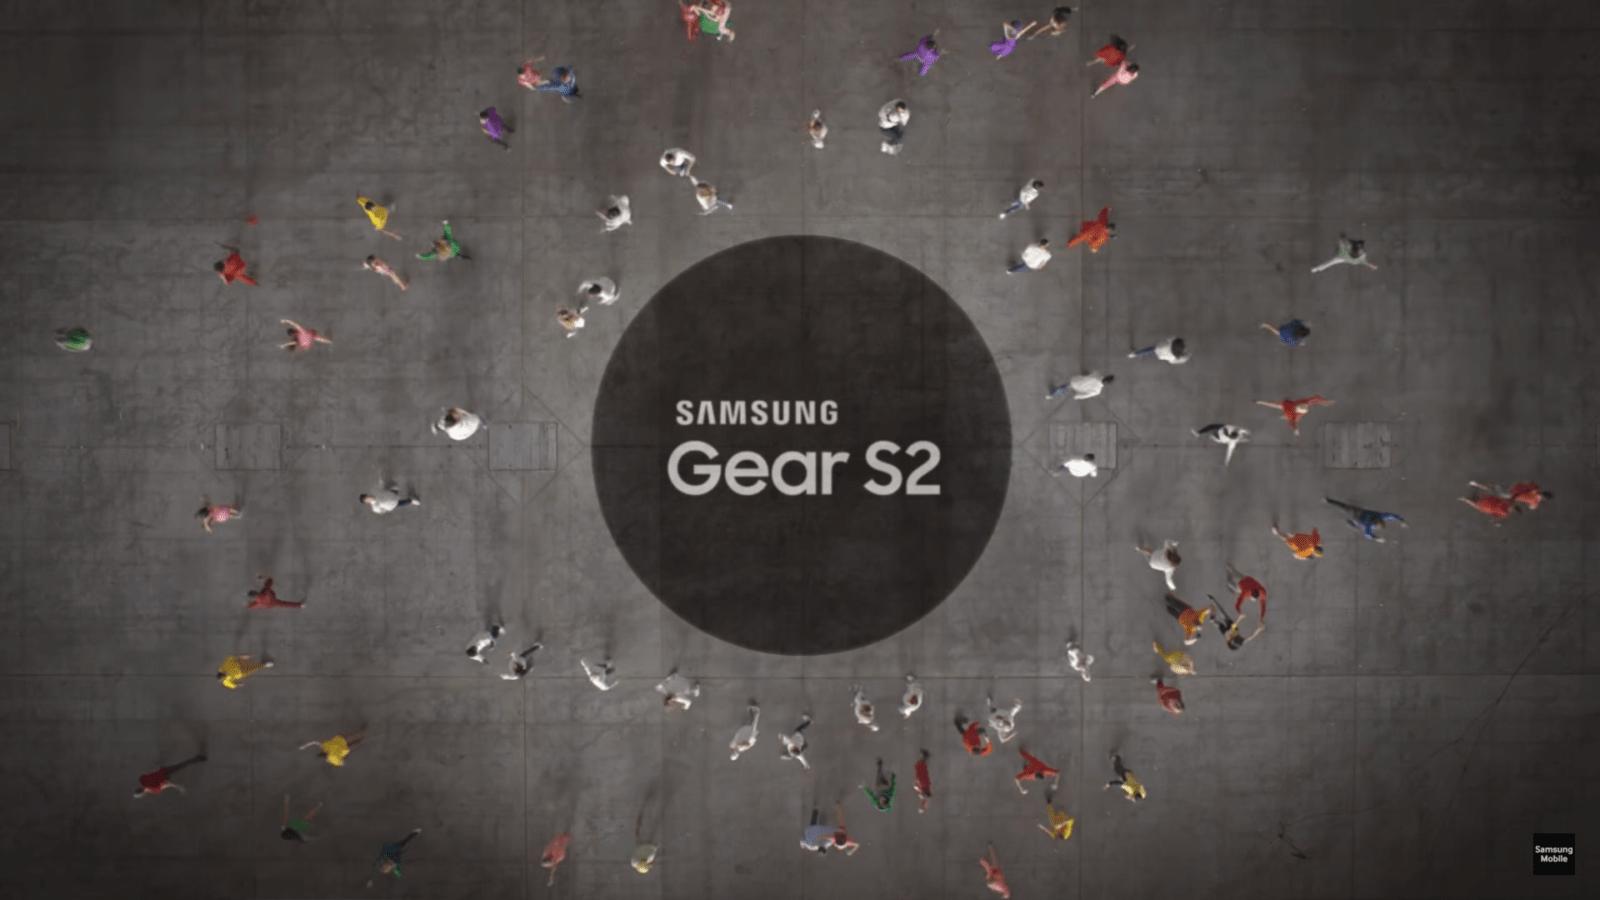 Gear S2 Promo Video